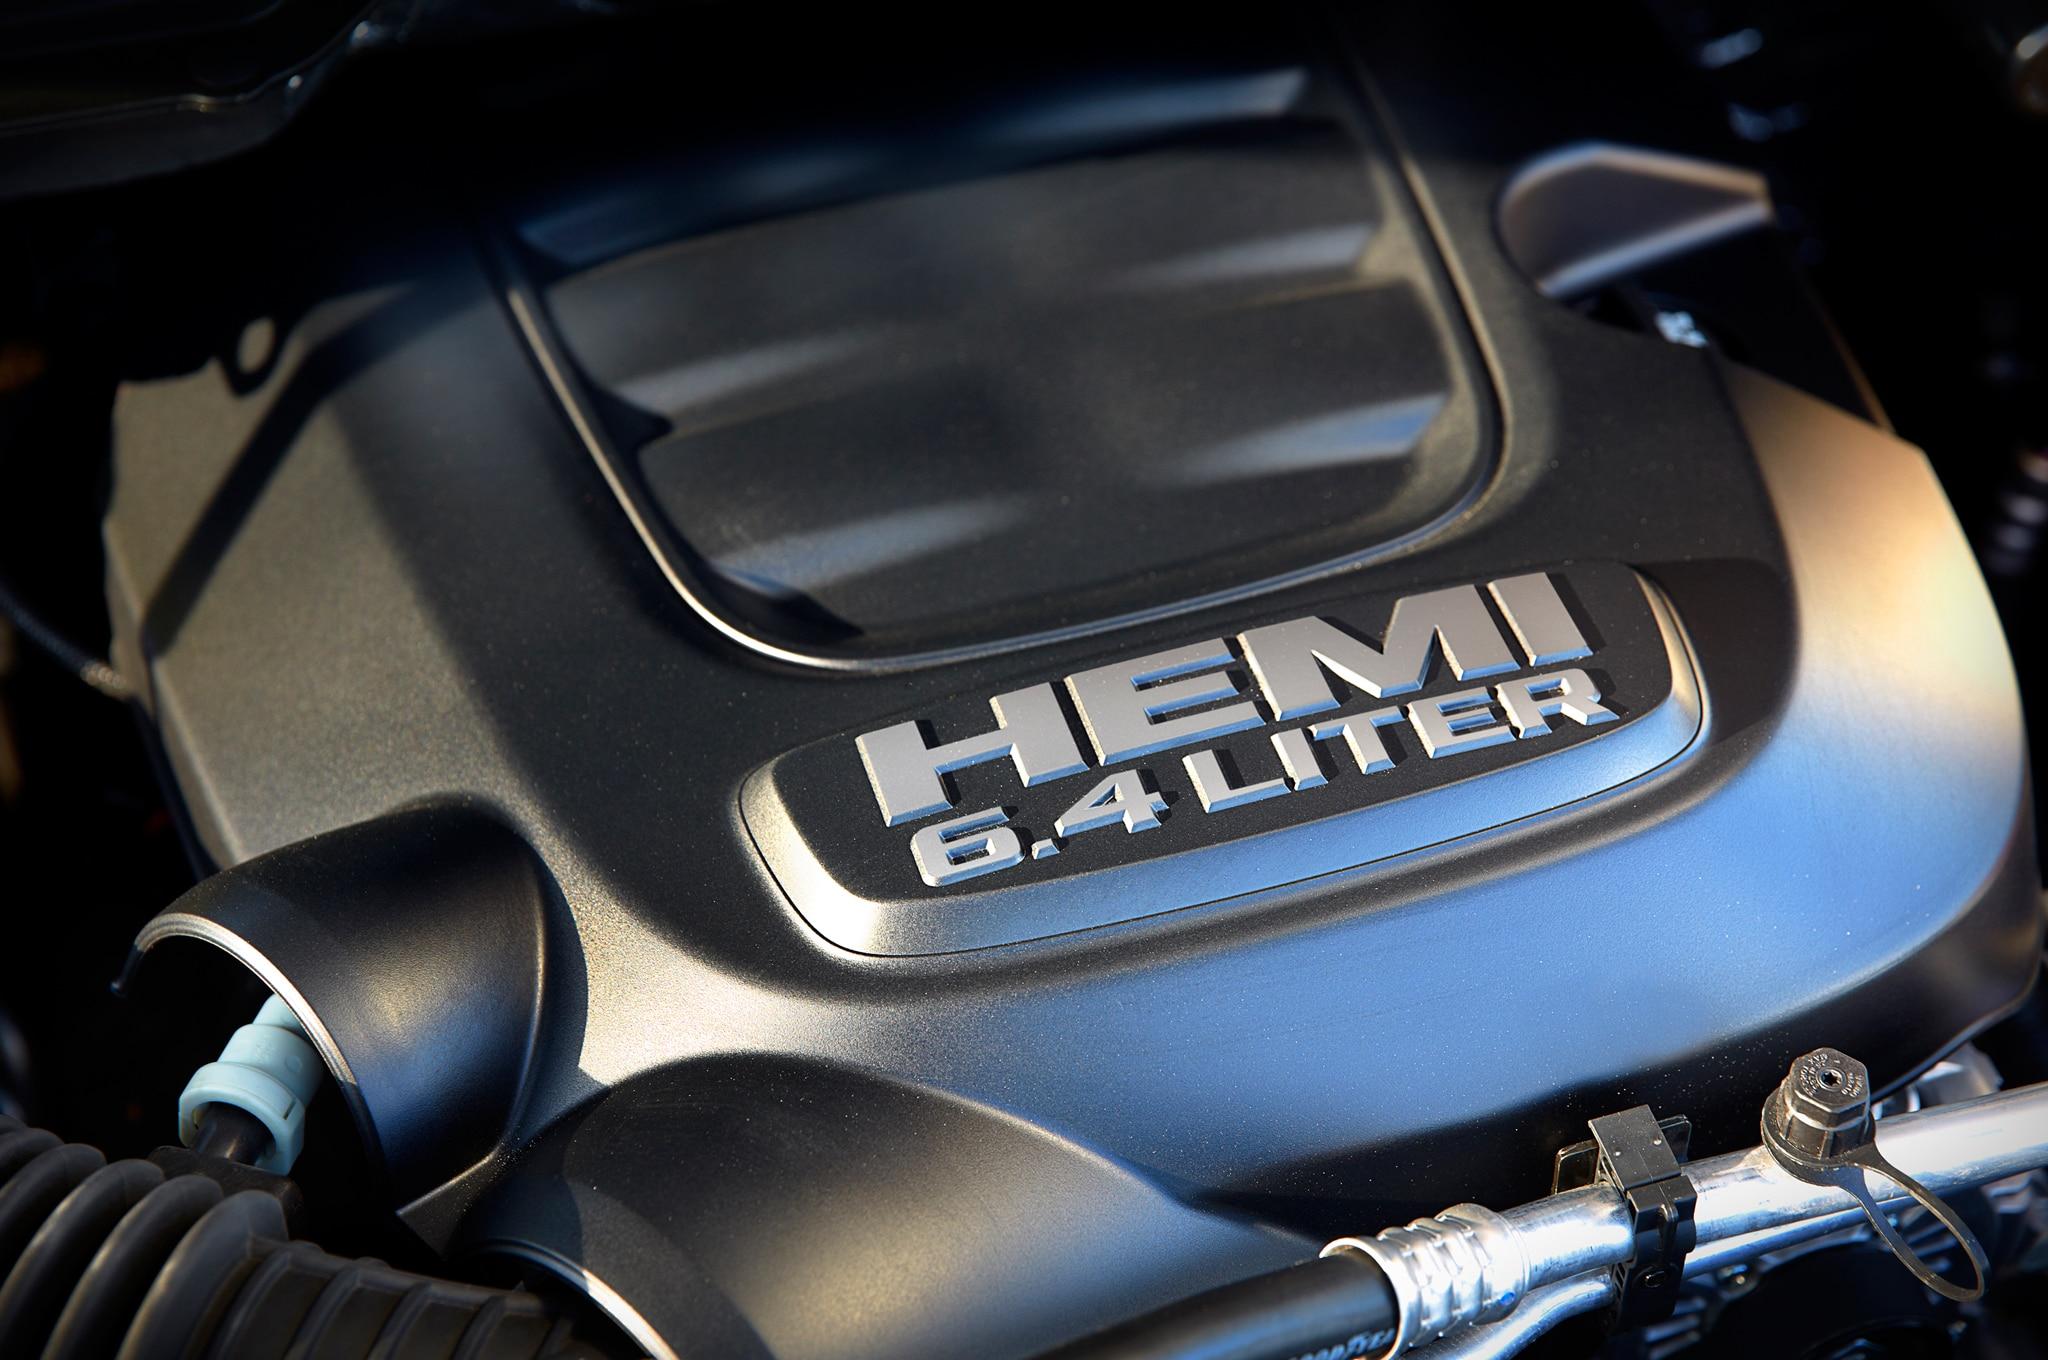 Ram 6 4 Hemi >> 2014 Ram Heavy Duty 6 4 Liter Hemi V 8 Truckin Magazine